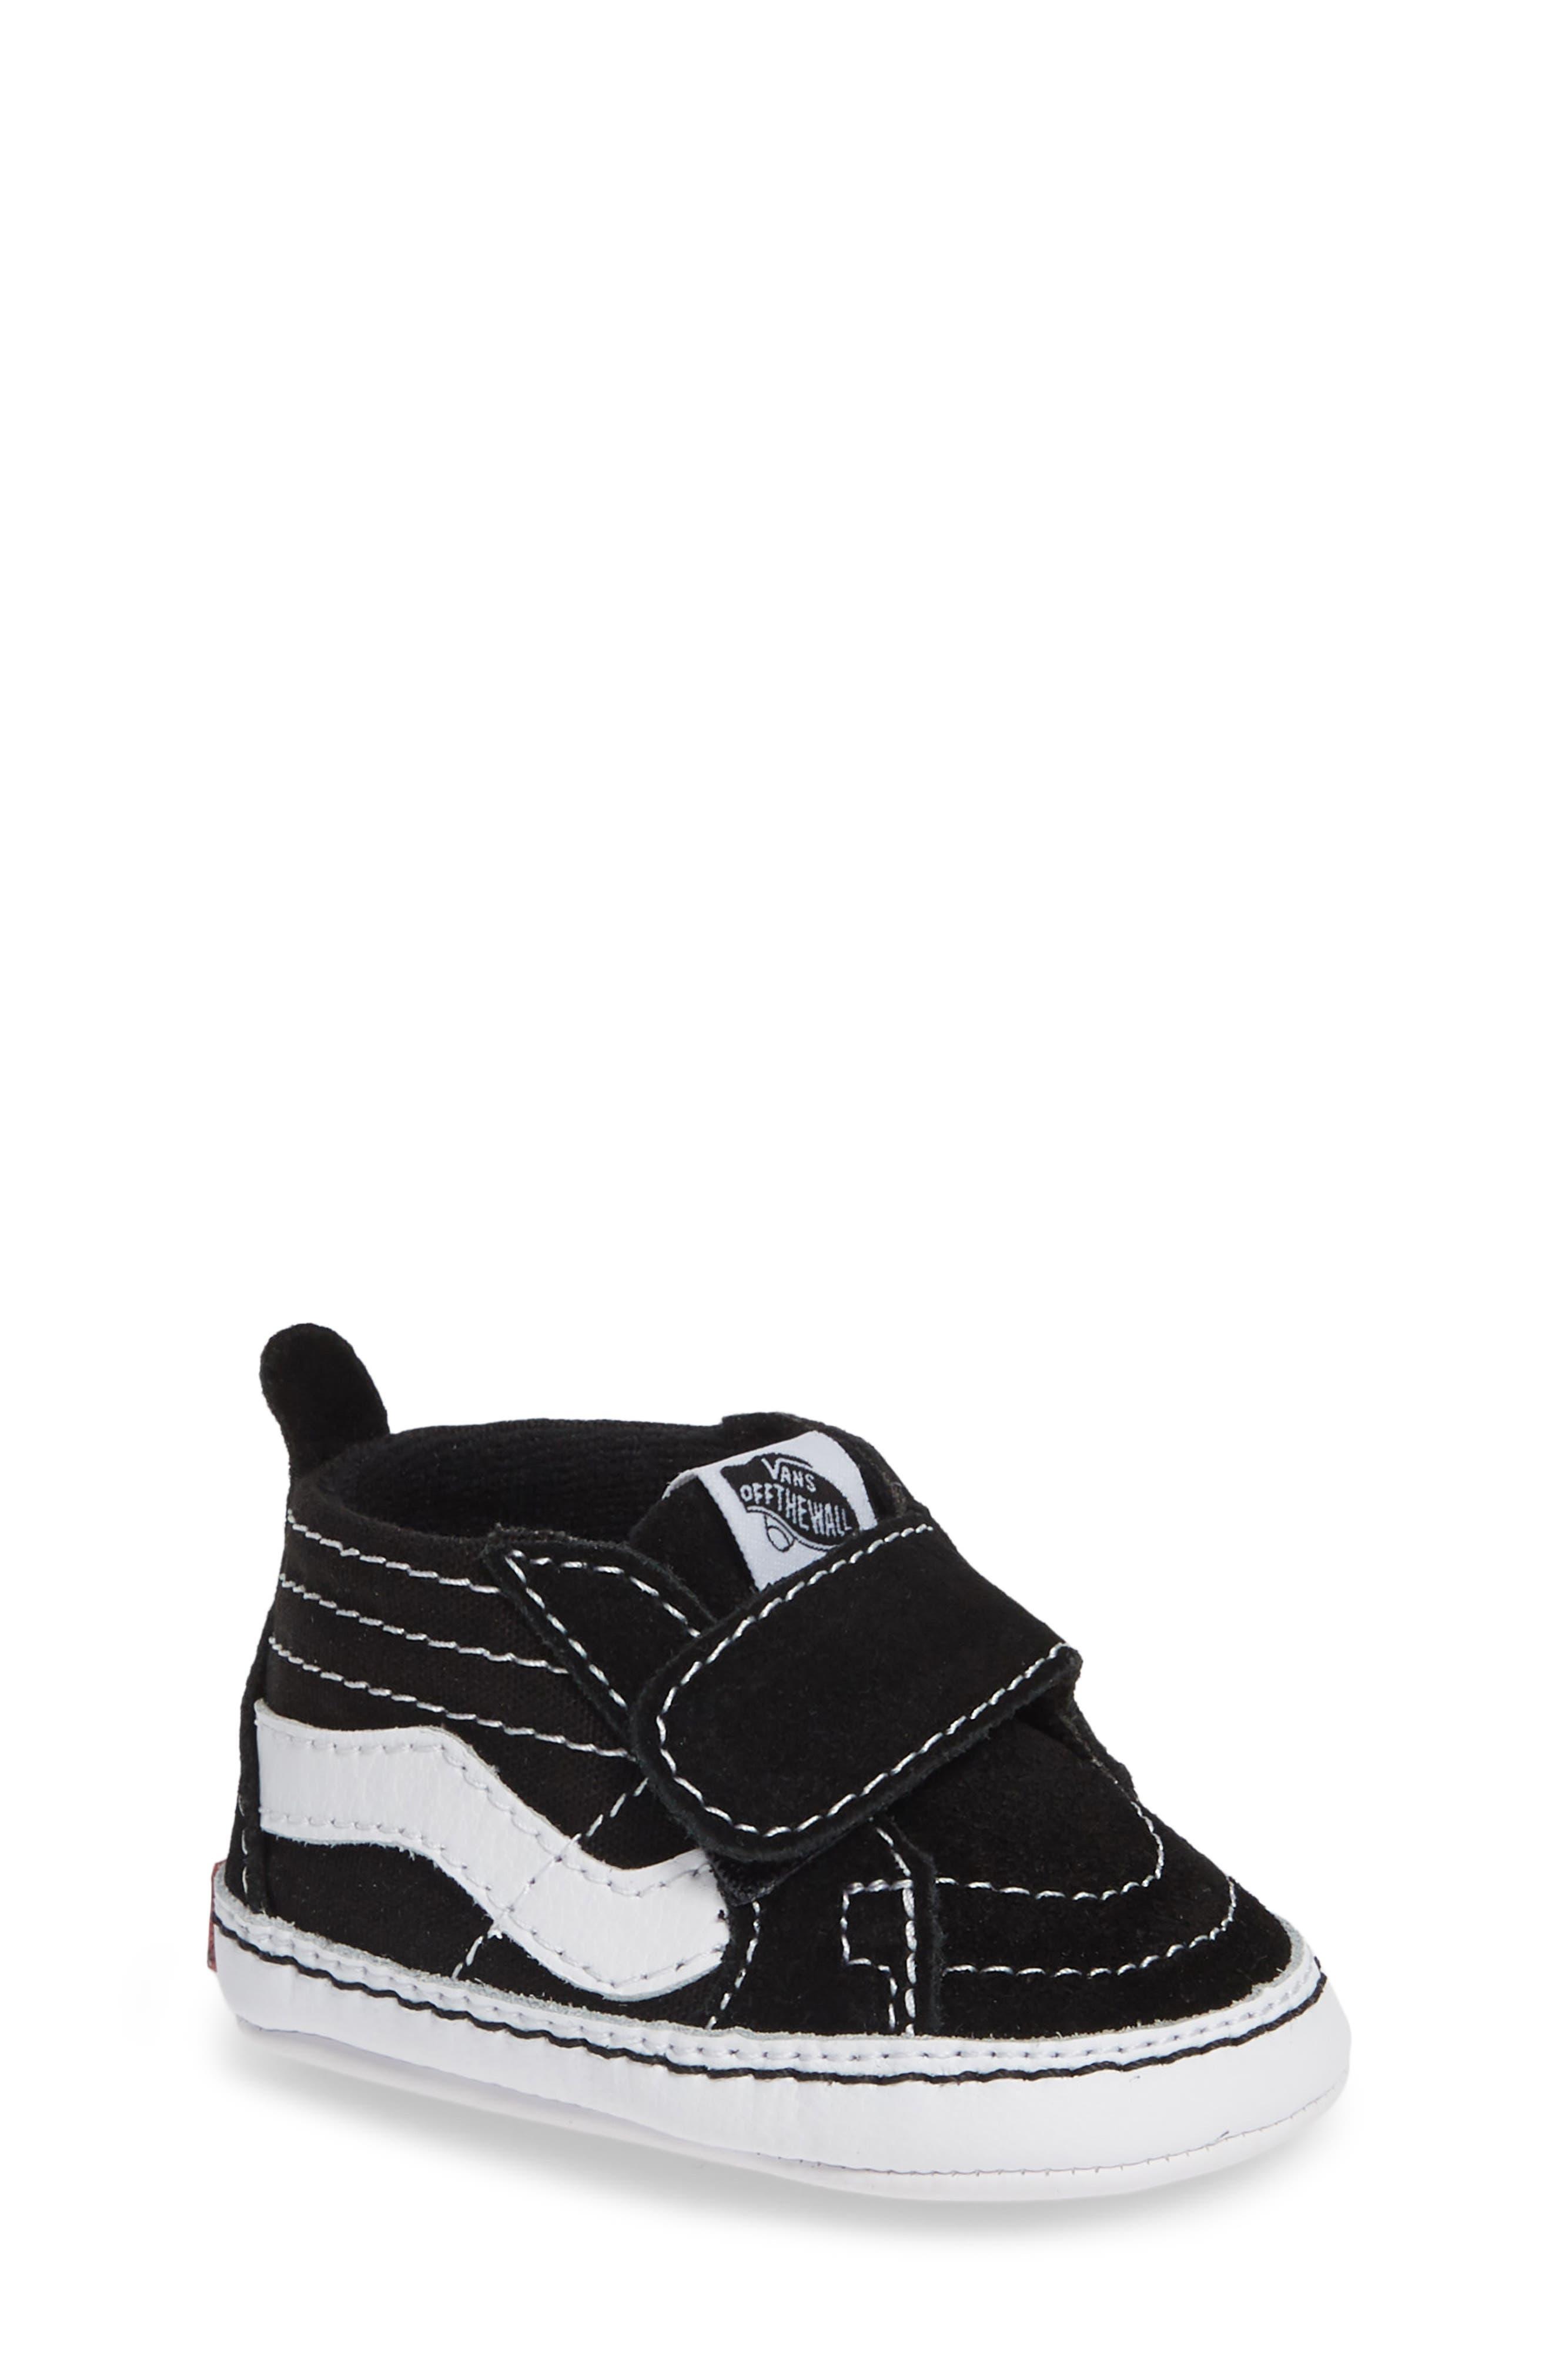 VANS 'SK8-Hi' Crib Sneaker, Main, color, BLACK/TRUE WHITE